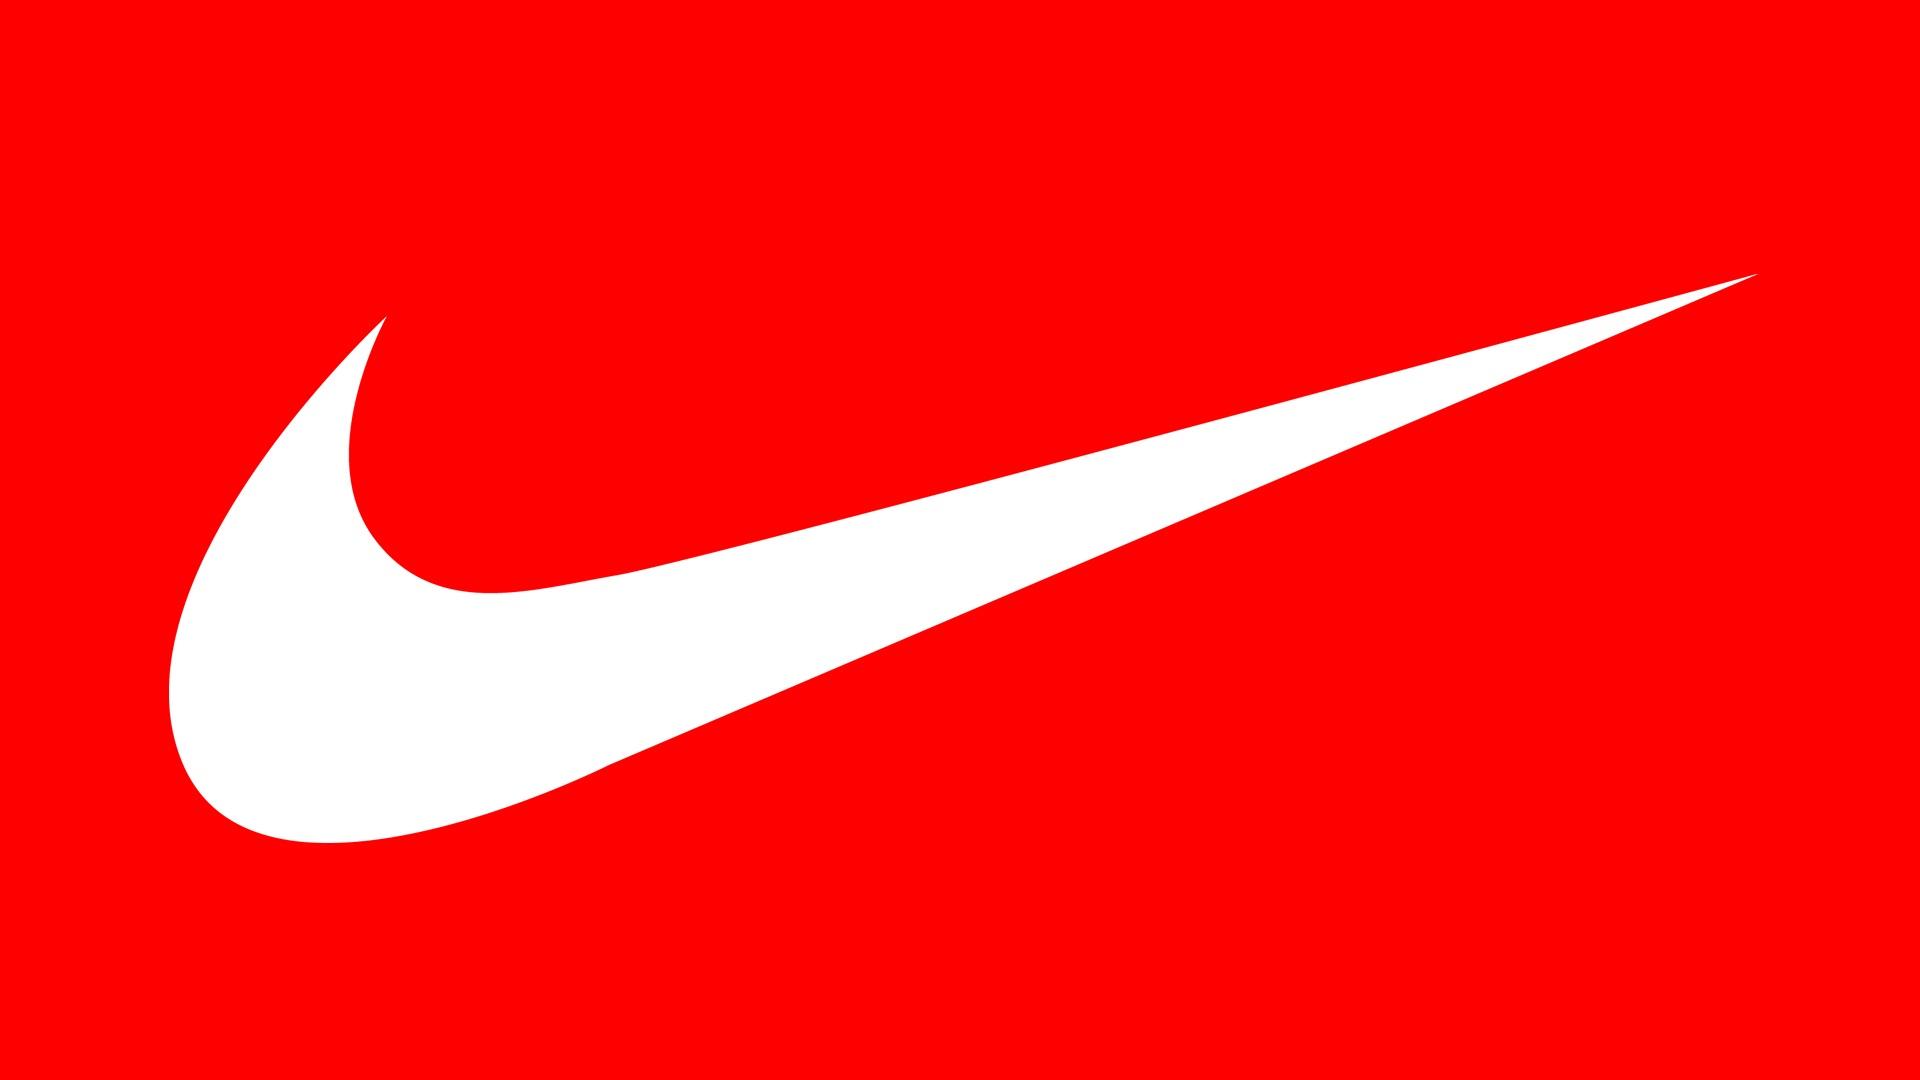 25 Impressive Nike Wallpapers For Desktop 1920x1080